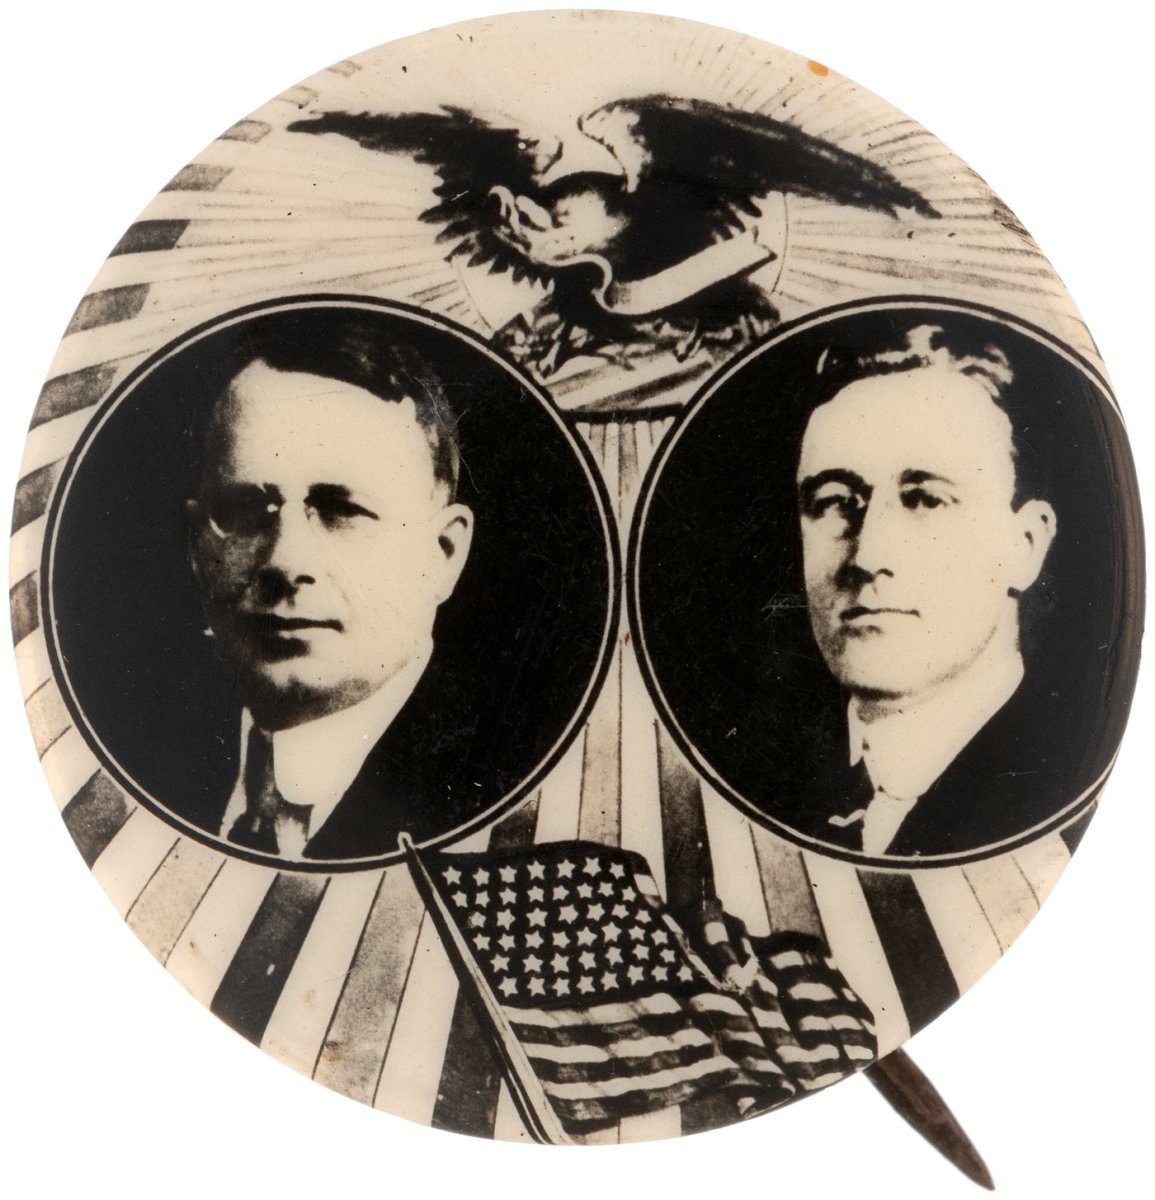 James M. Cox and Franklin D. Roosevelt jugate button.